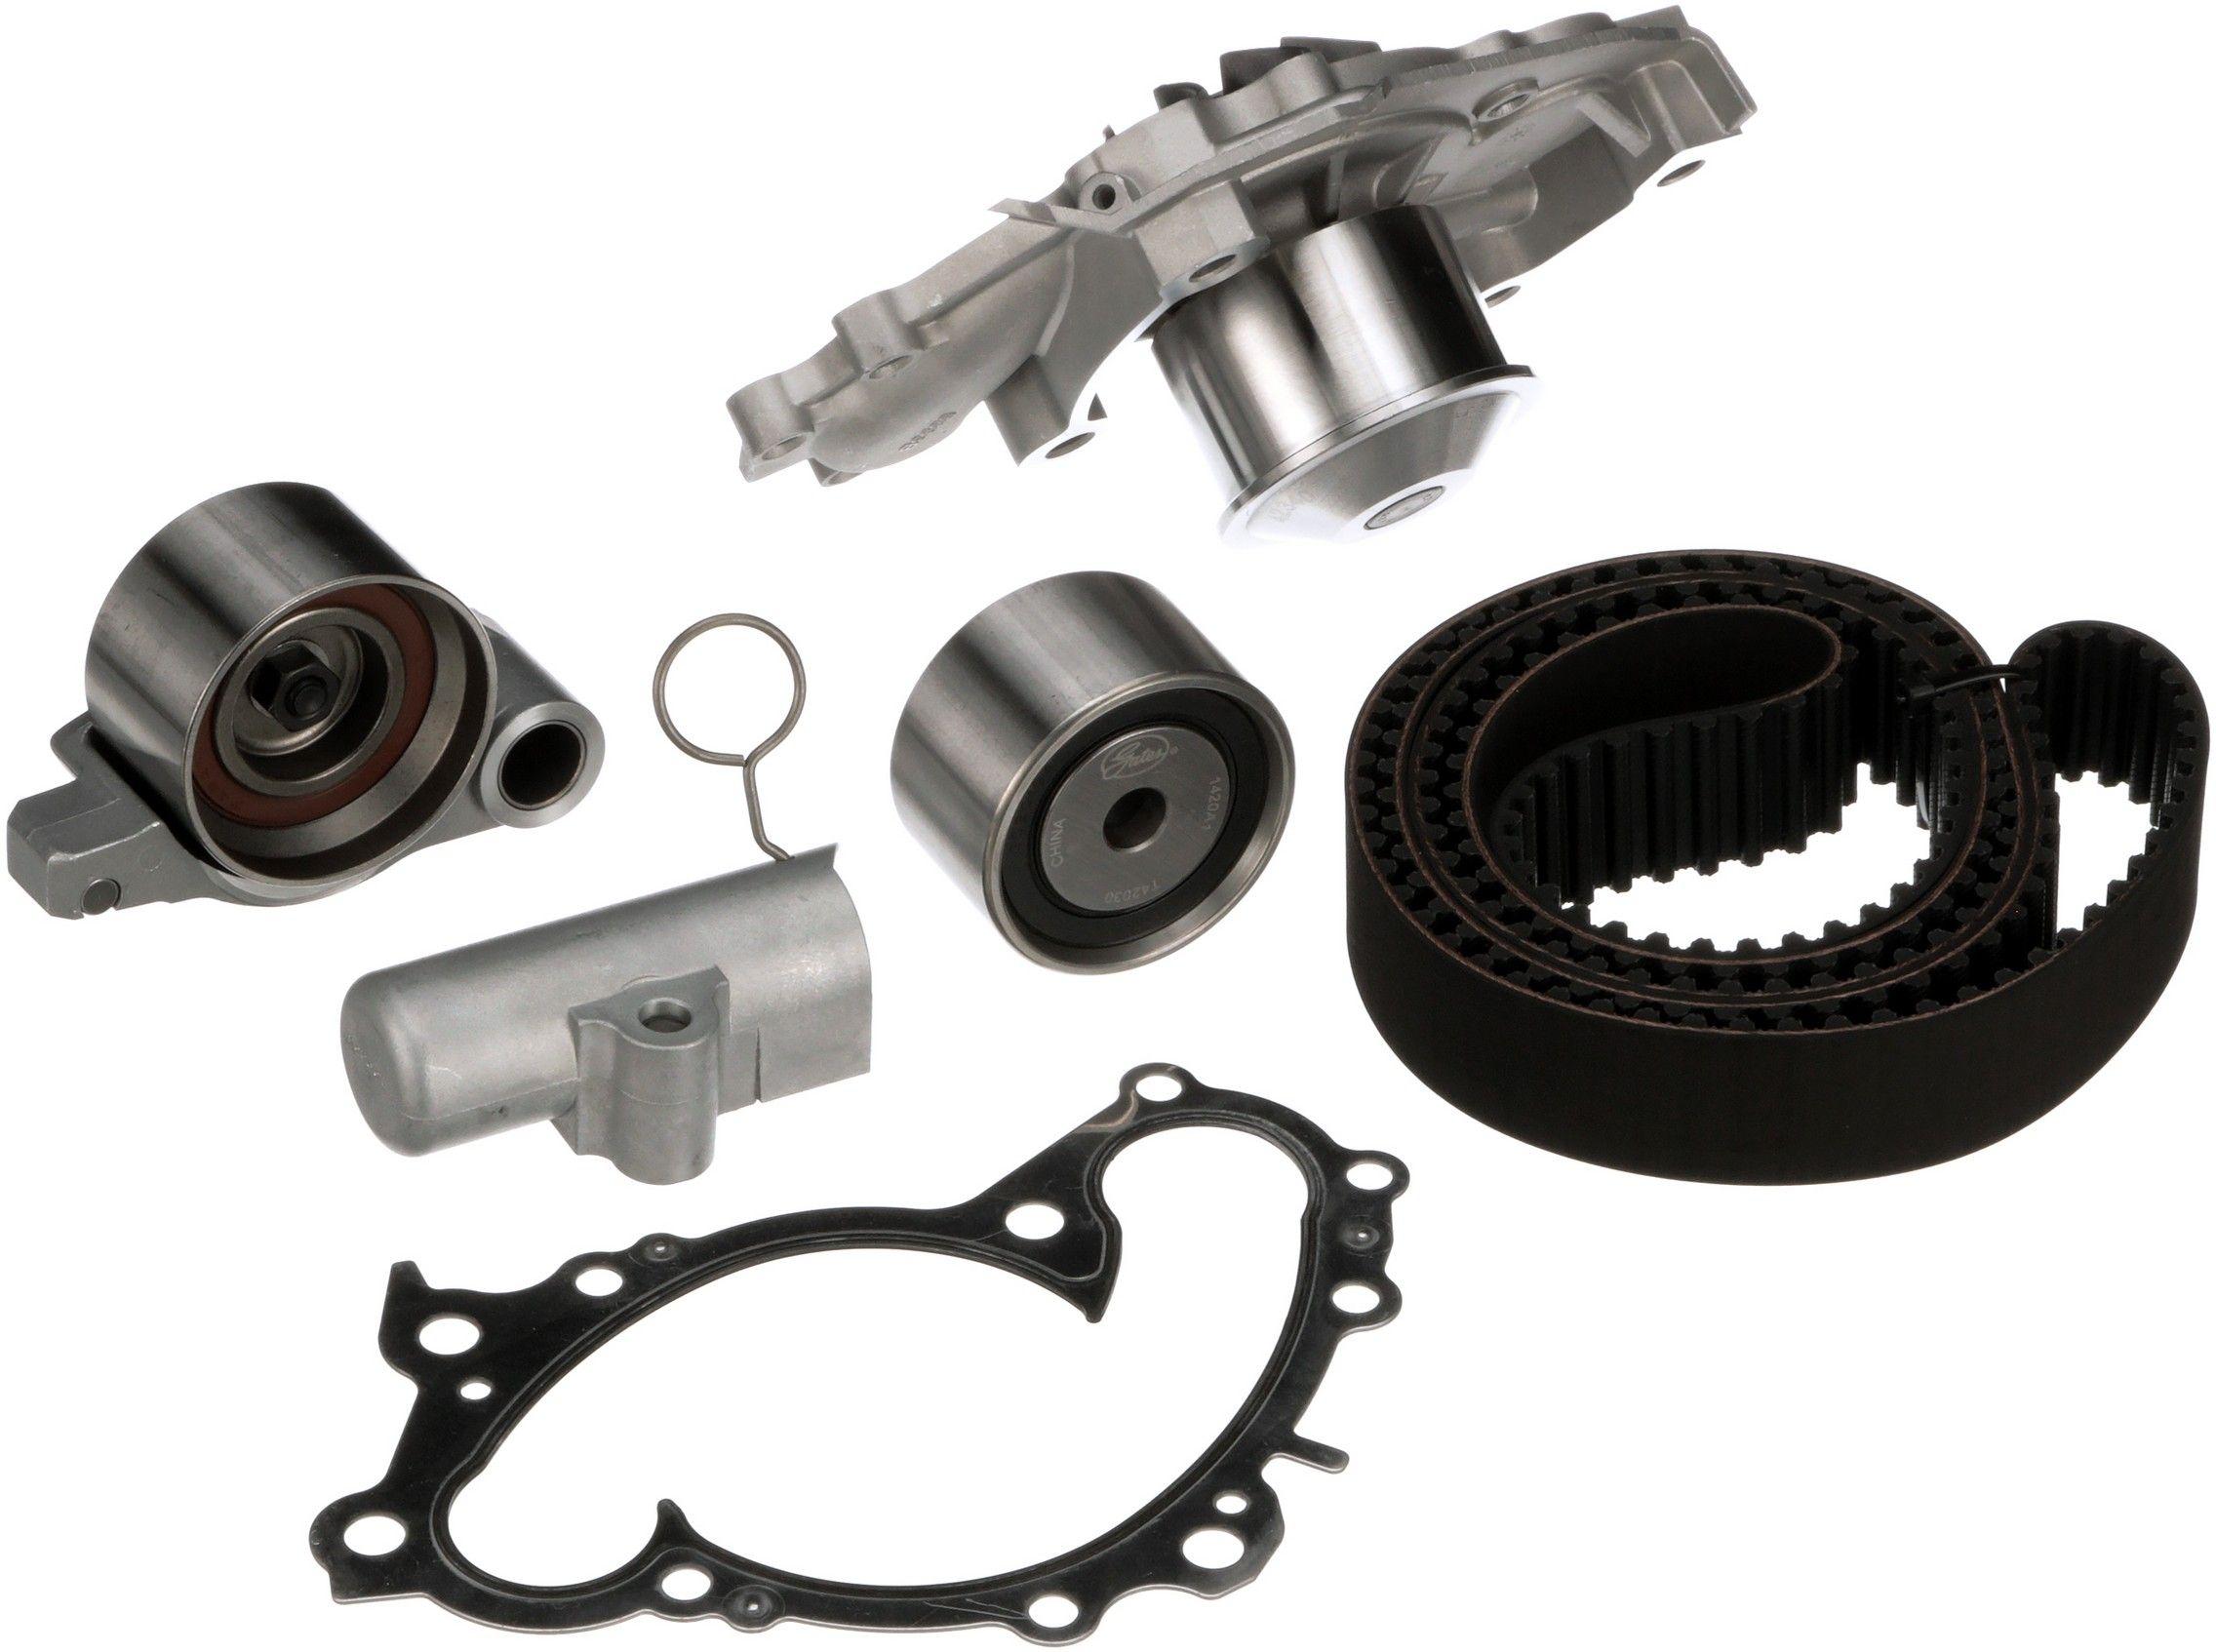 Lexus Es330 Engine Timing Belt Kit With Water Pump Replacement 1993 Es 300 2006 6 Cyl 33l Gates Tckwp257a